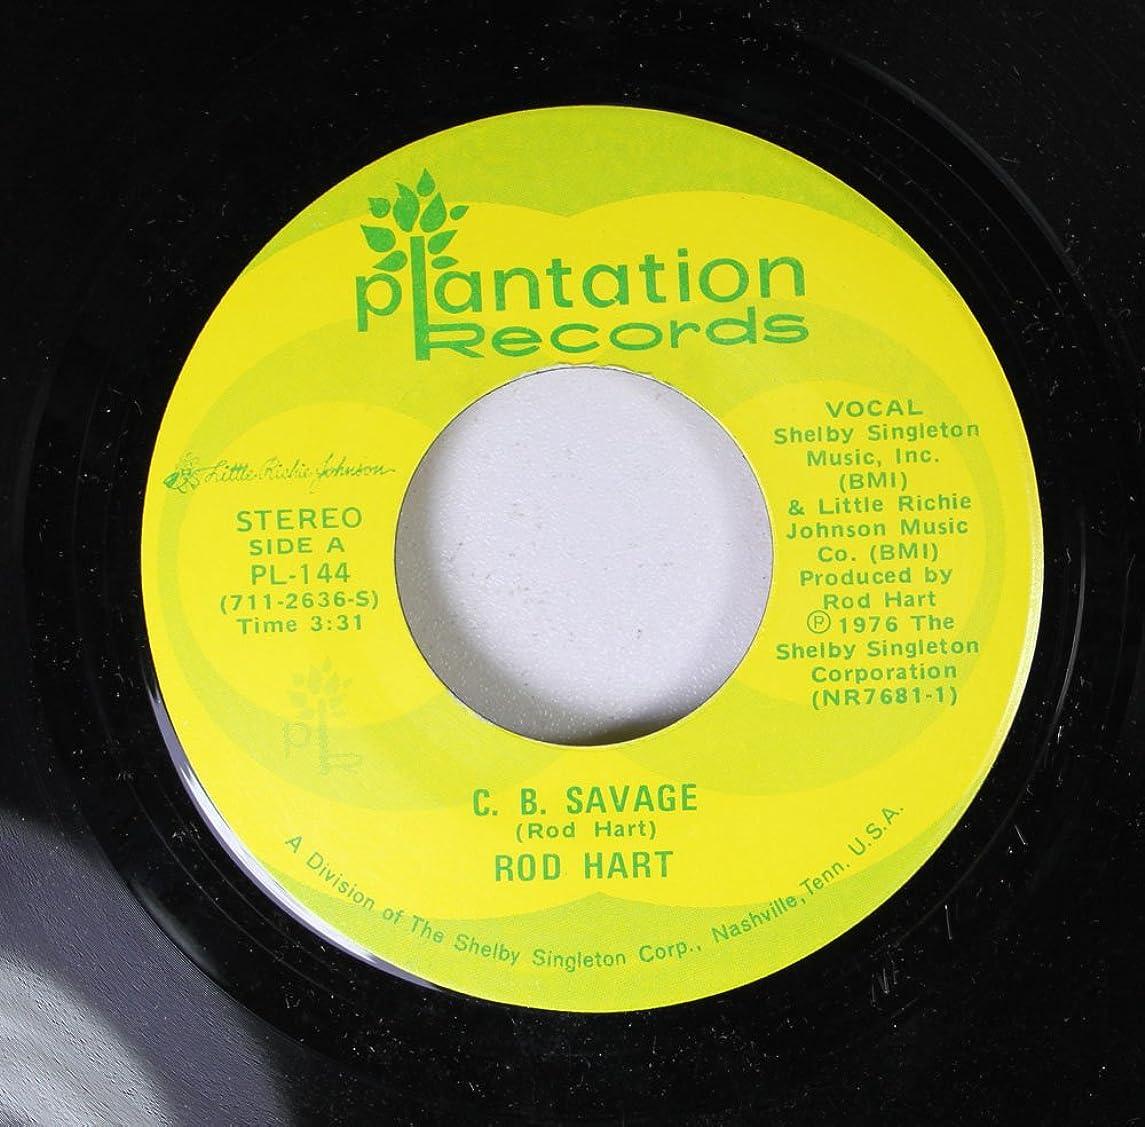 Rod Hart 45 RPM C.B. SAVAGE / BETTER OFF GONE